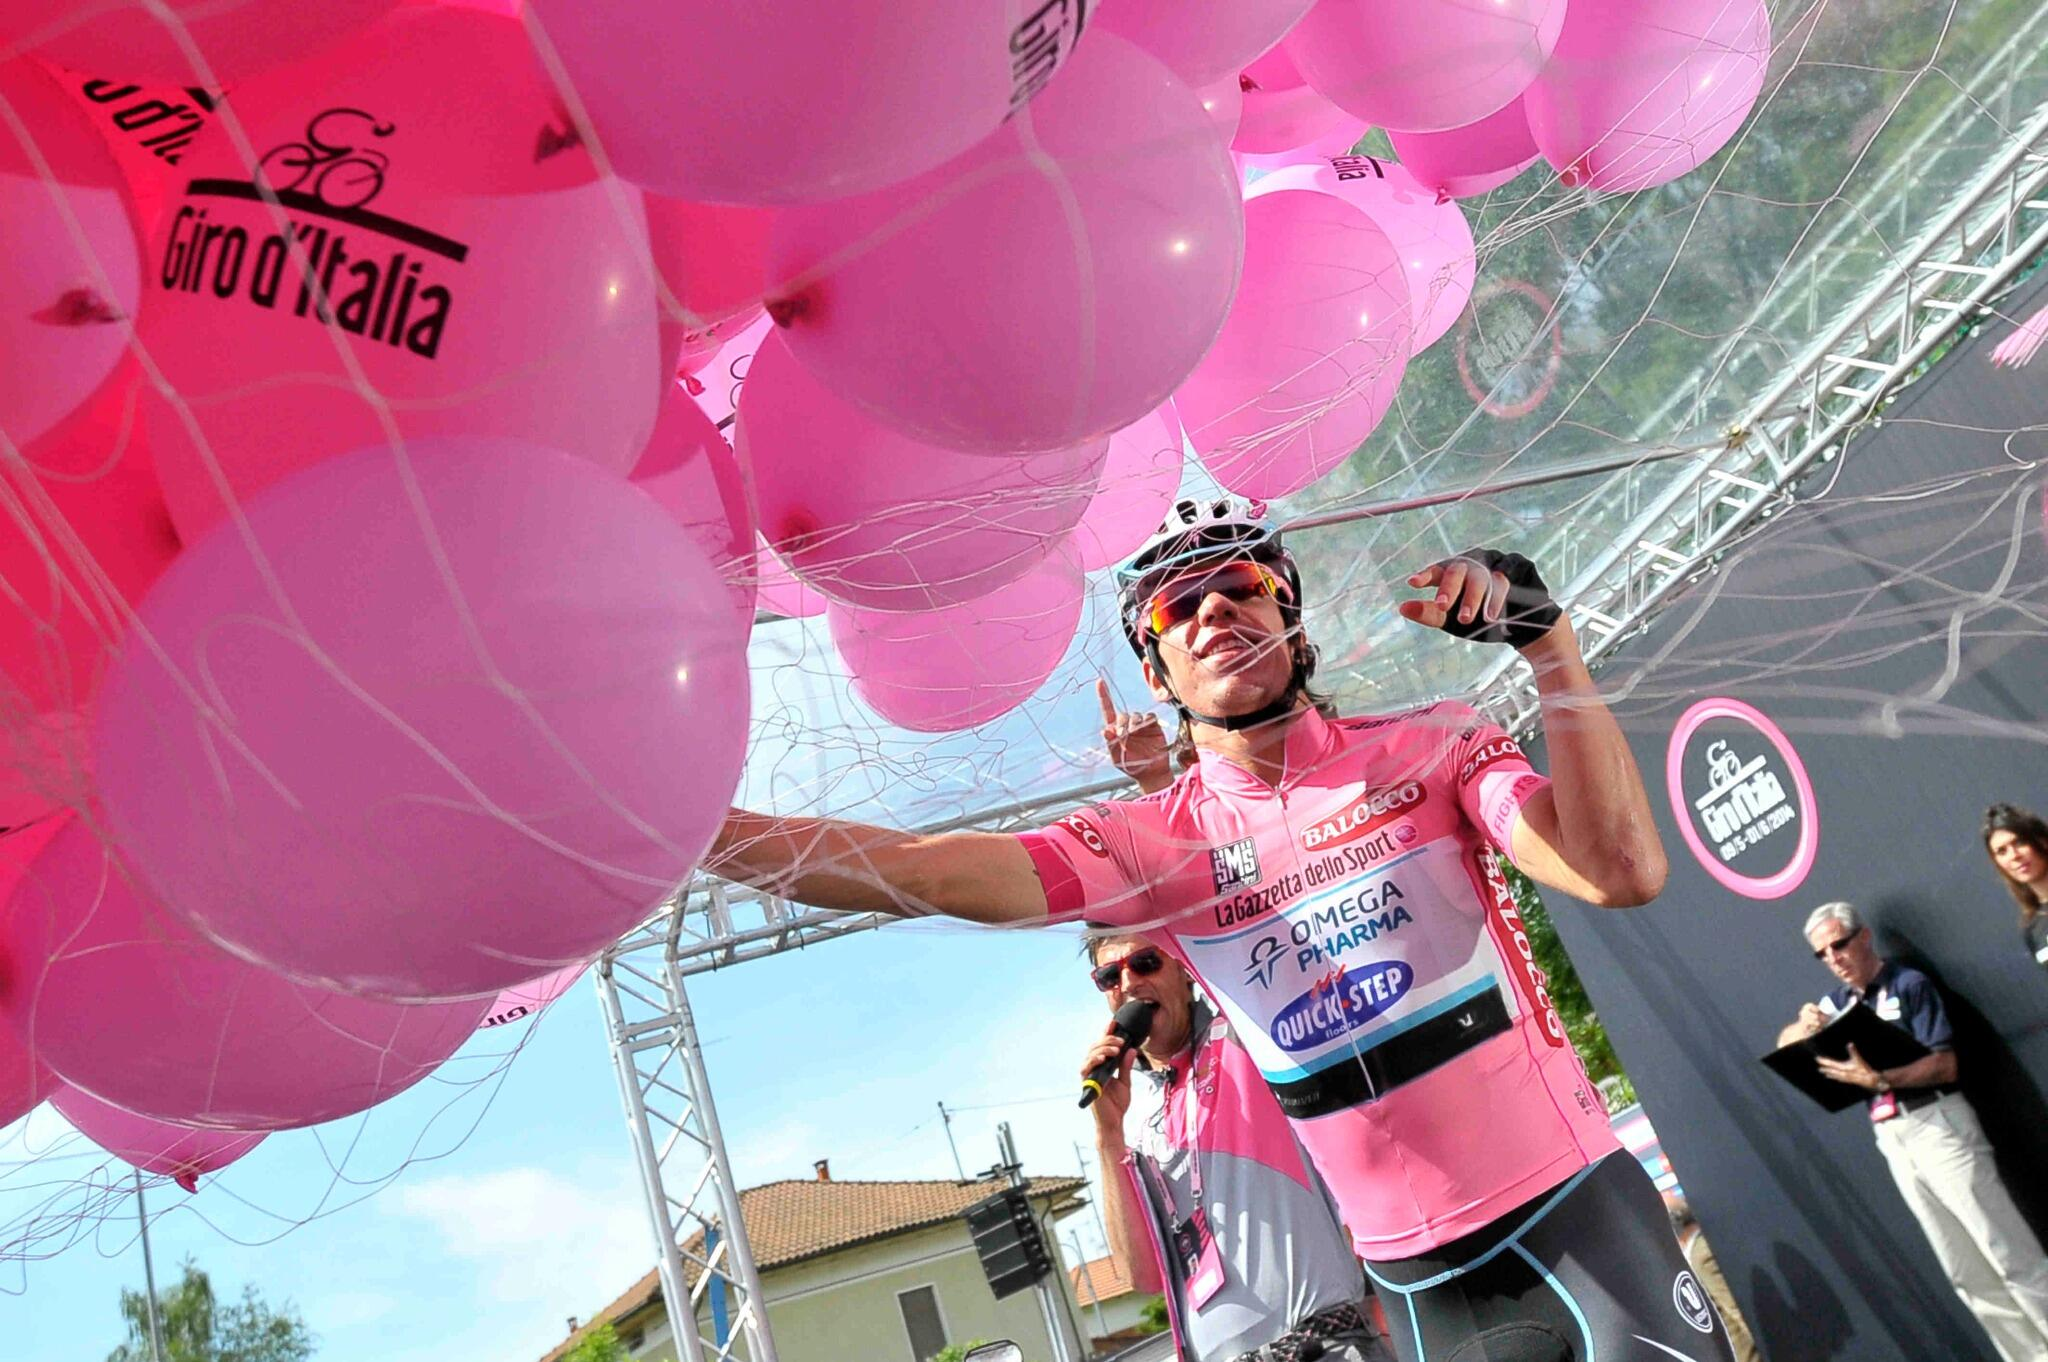 Giro d'Italia 2014 (Fight For Pink) - Página 23 BoempbKIEAAXGpu